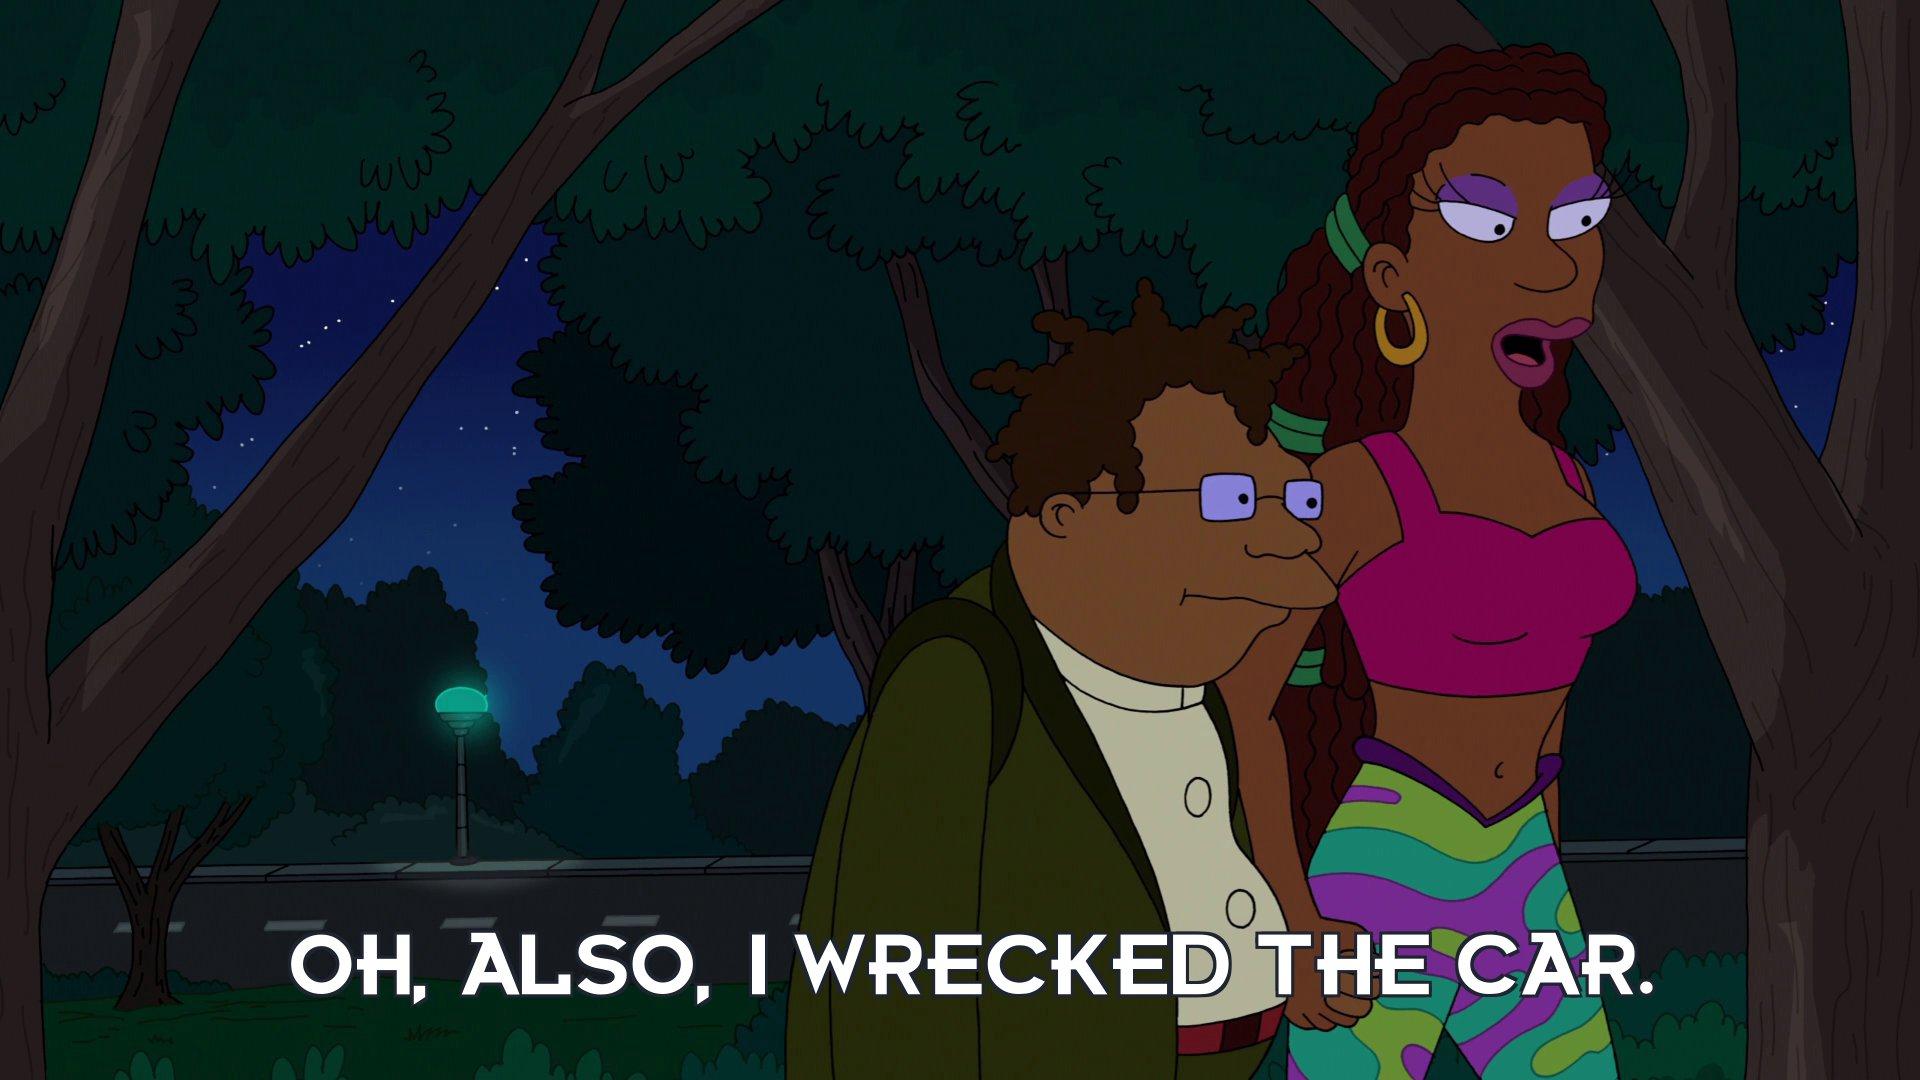 LaBarbara Conrad: Oh, also, I wrecked the car.